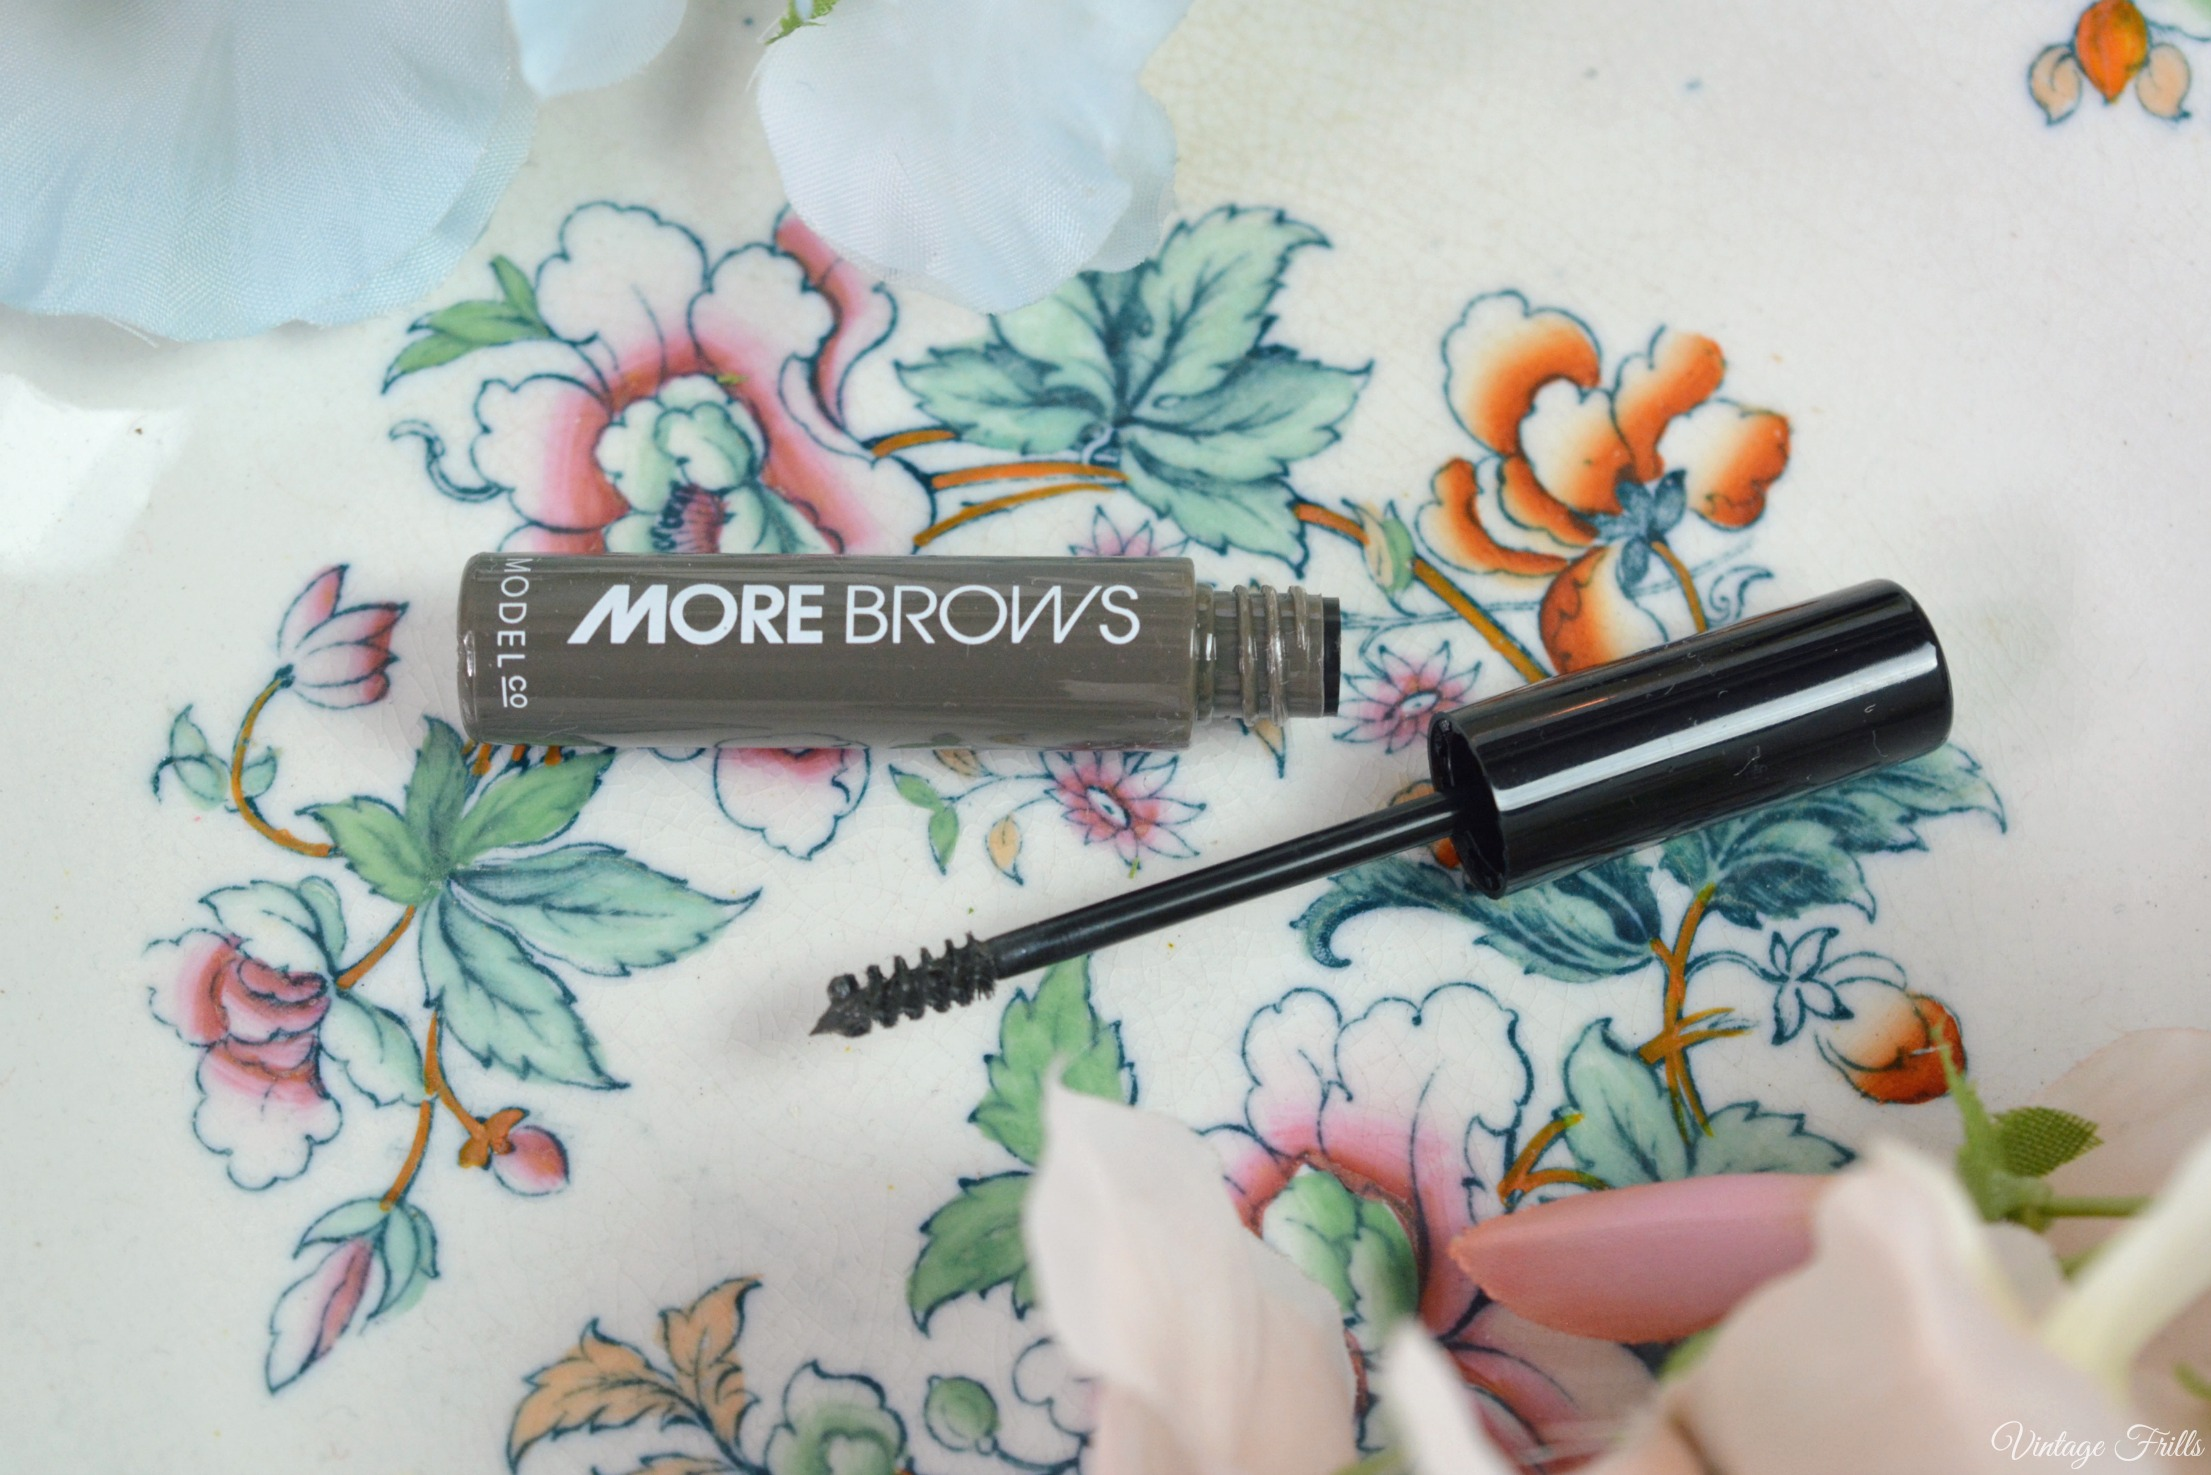 Birchbox March 2016 ModelCo More Brows